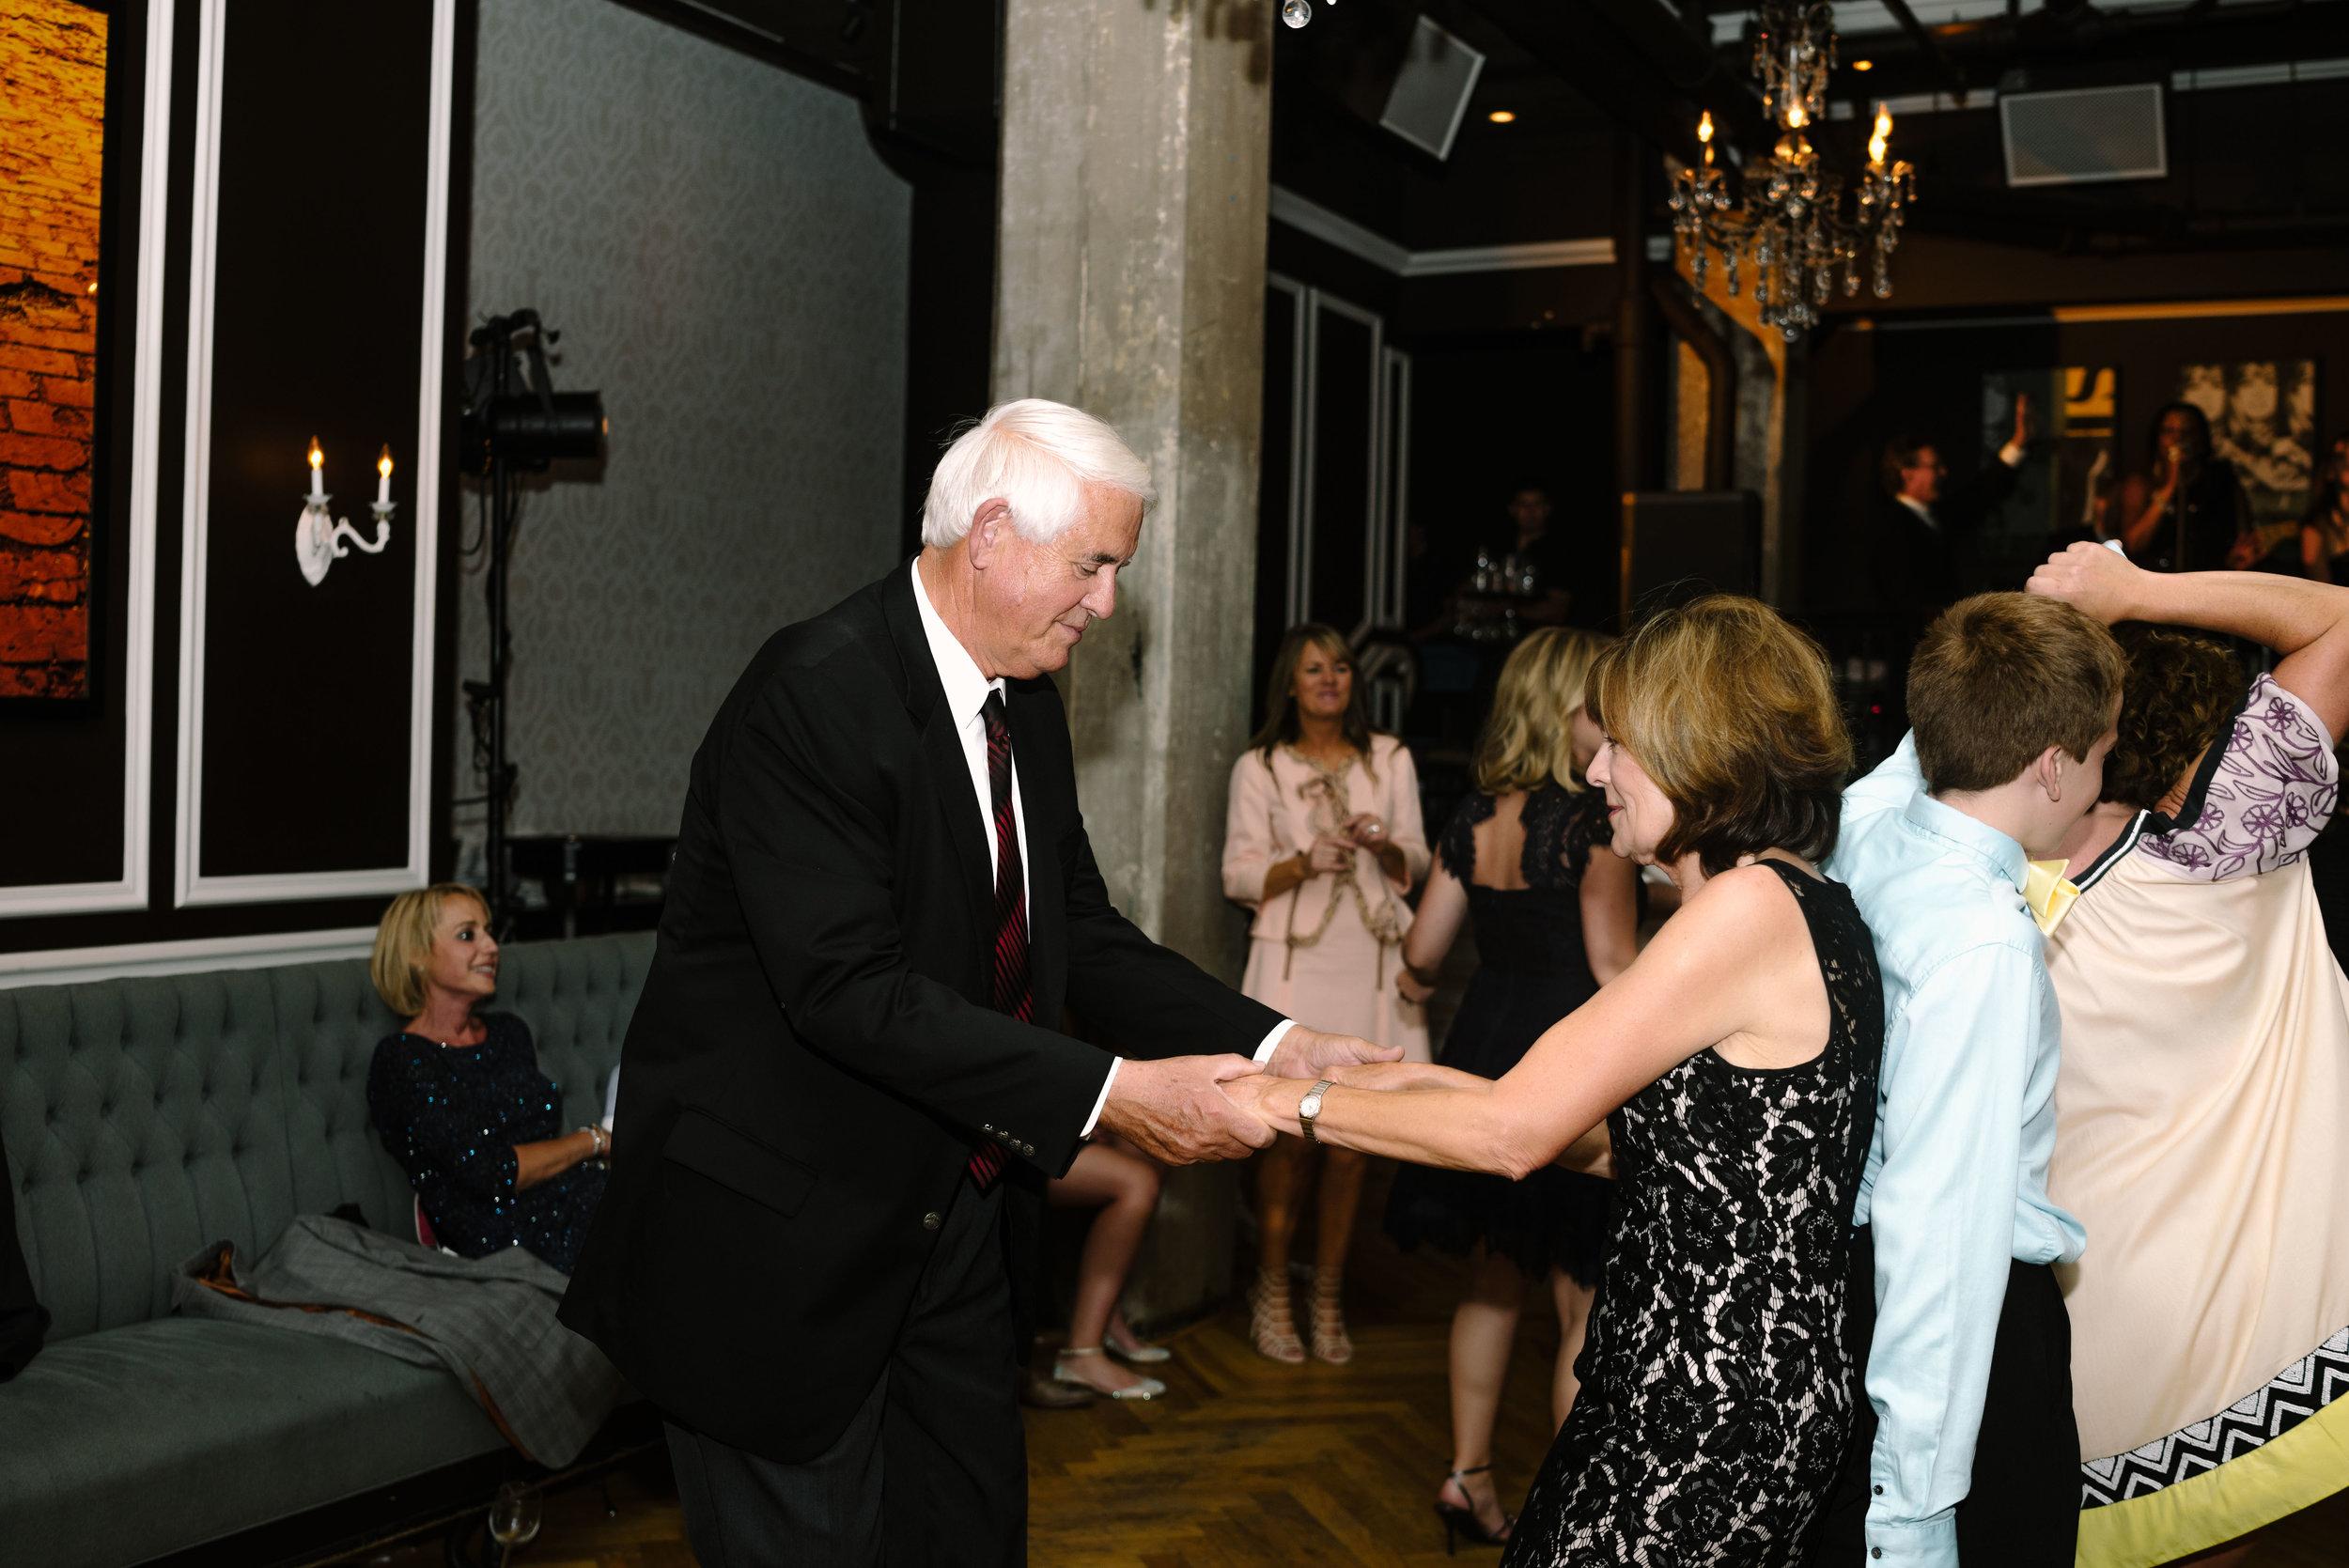 Patricia-Steve-Blog-Indianapolis-Wedding-147.jpg